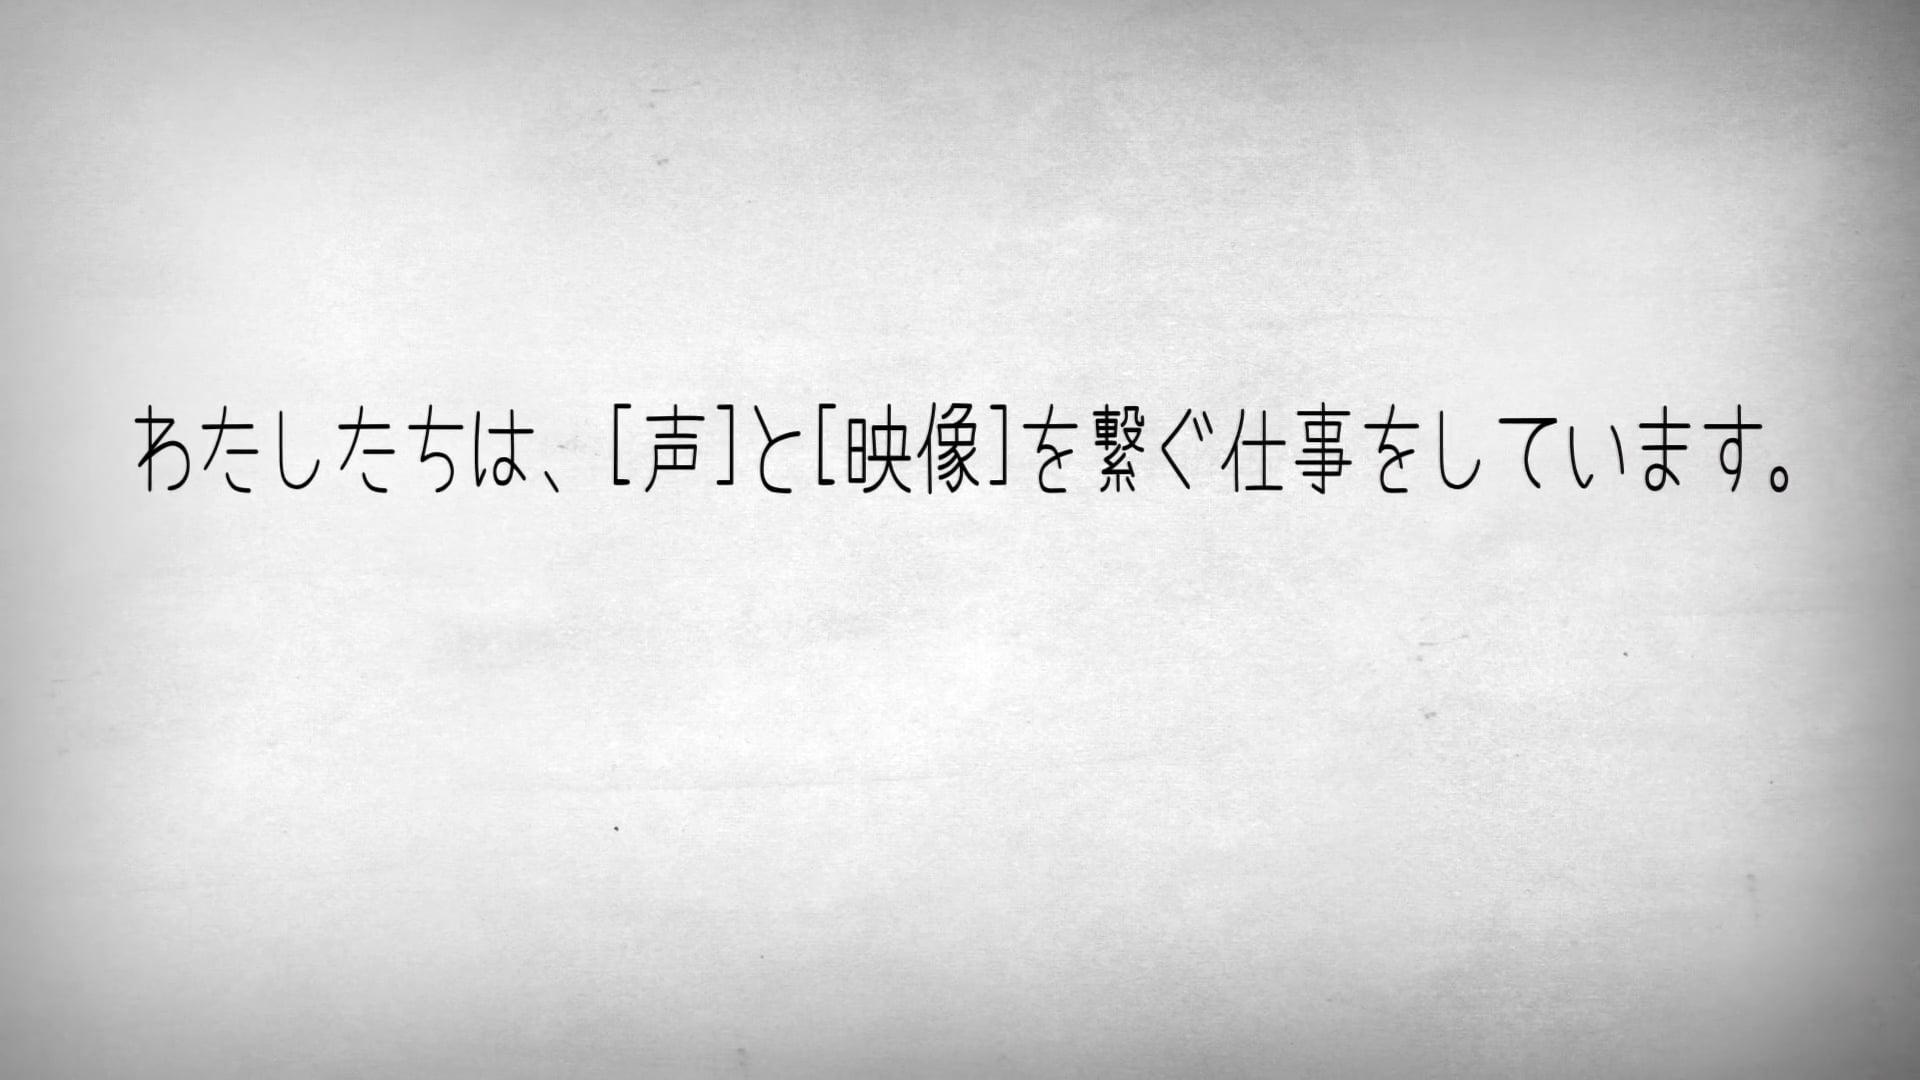 20160922-h-ボイスプロ紹介映像